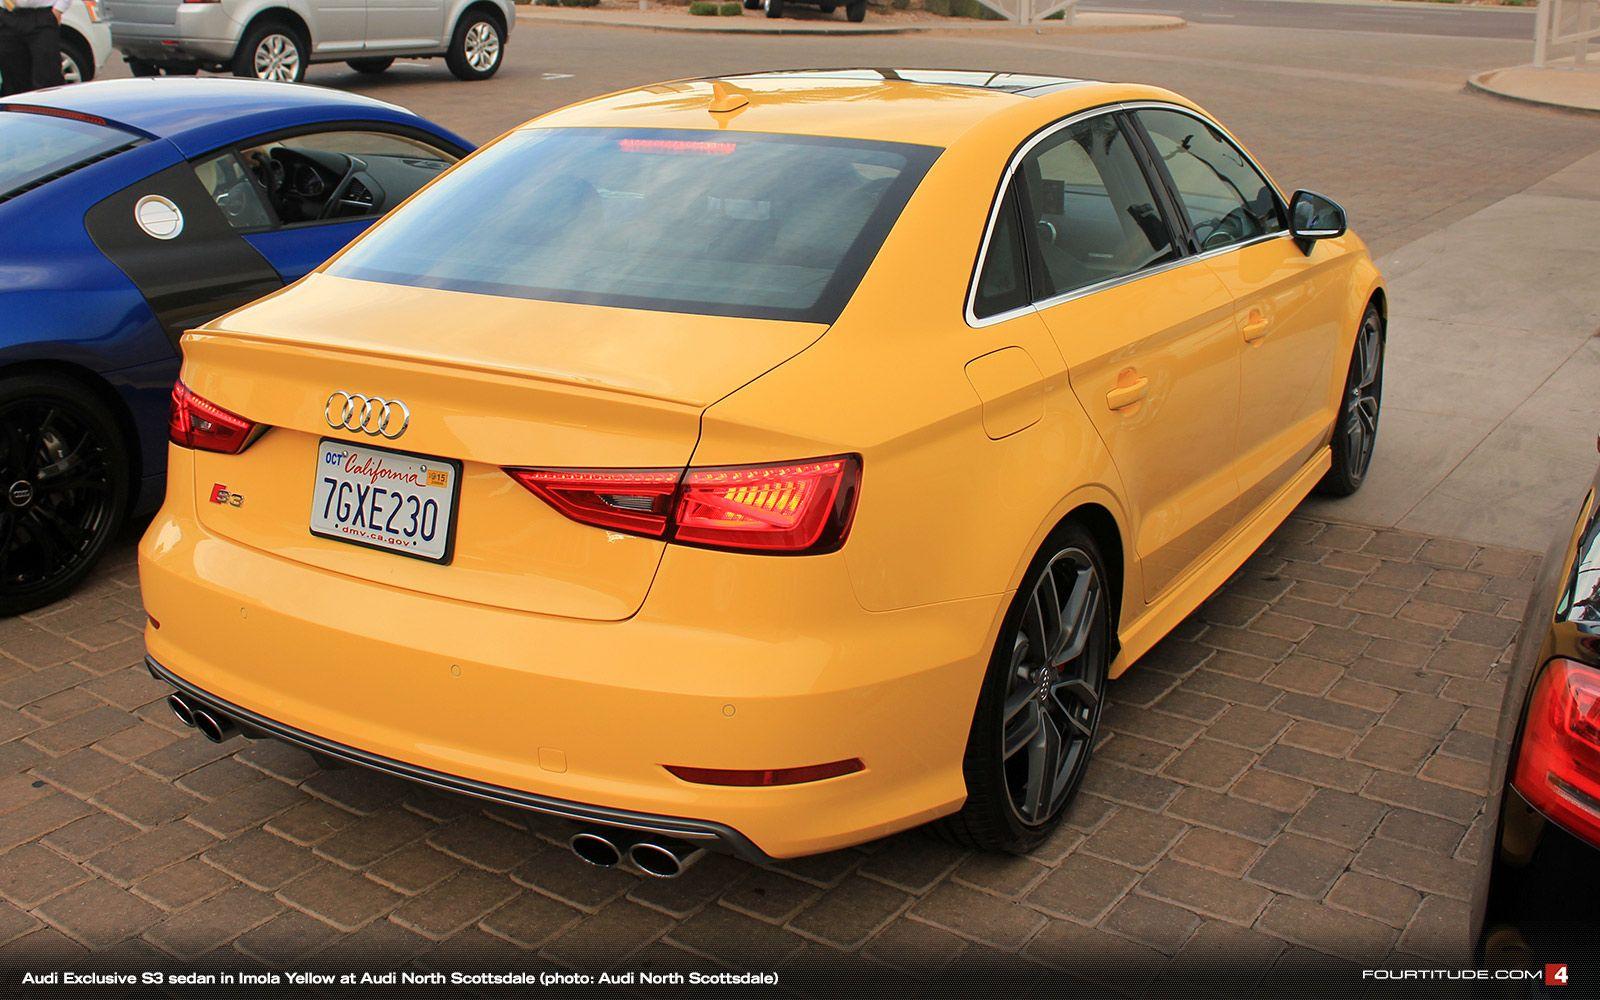 Audi Exclusive Imola Yellow S3 Sedan Photo Brian